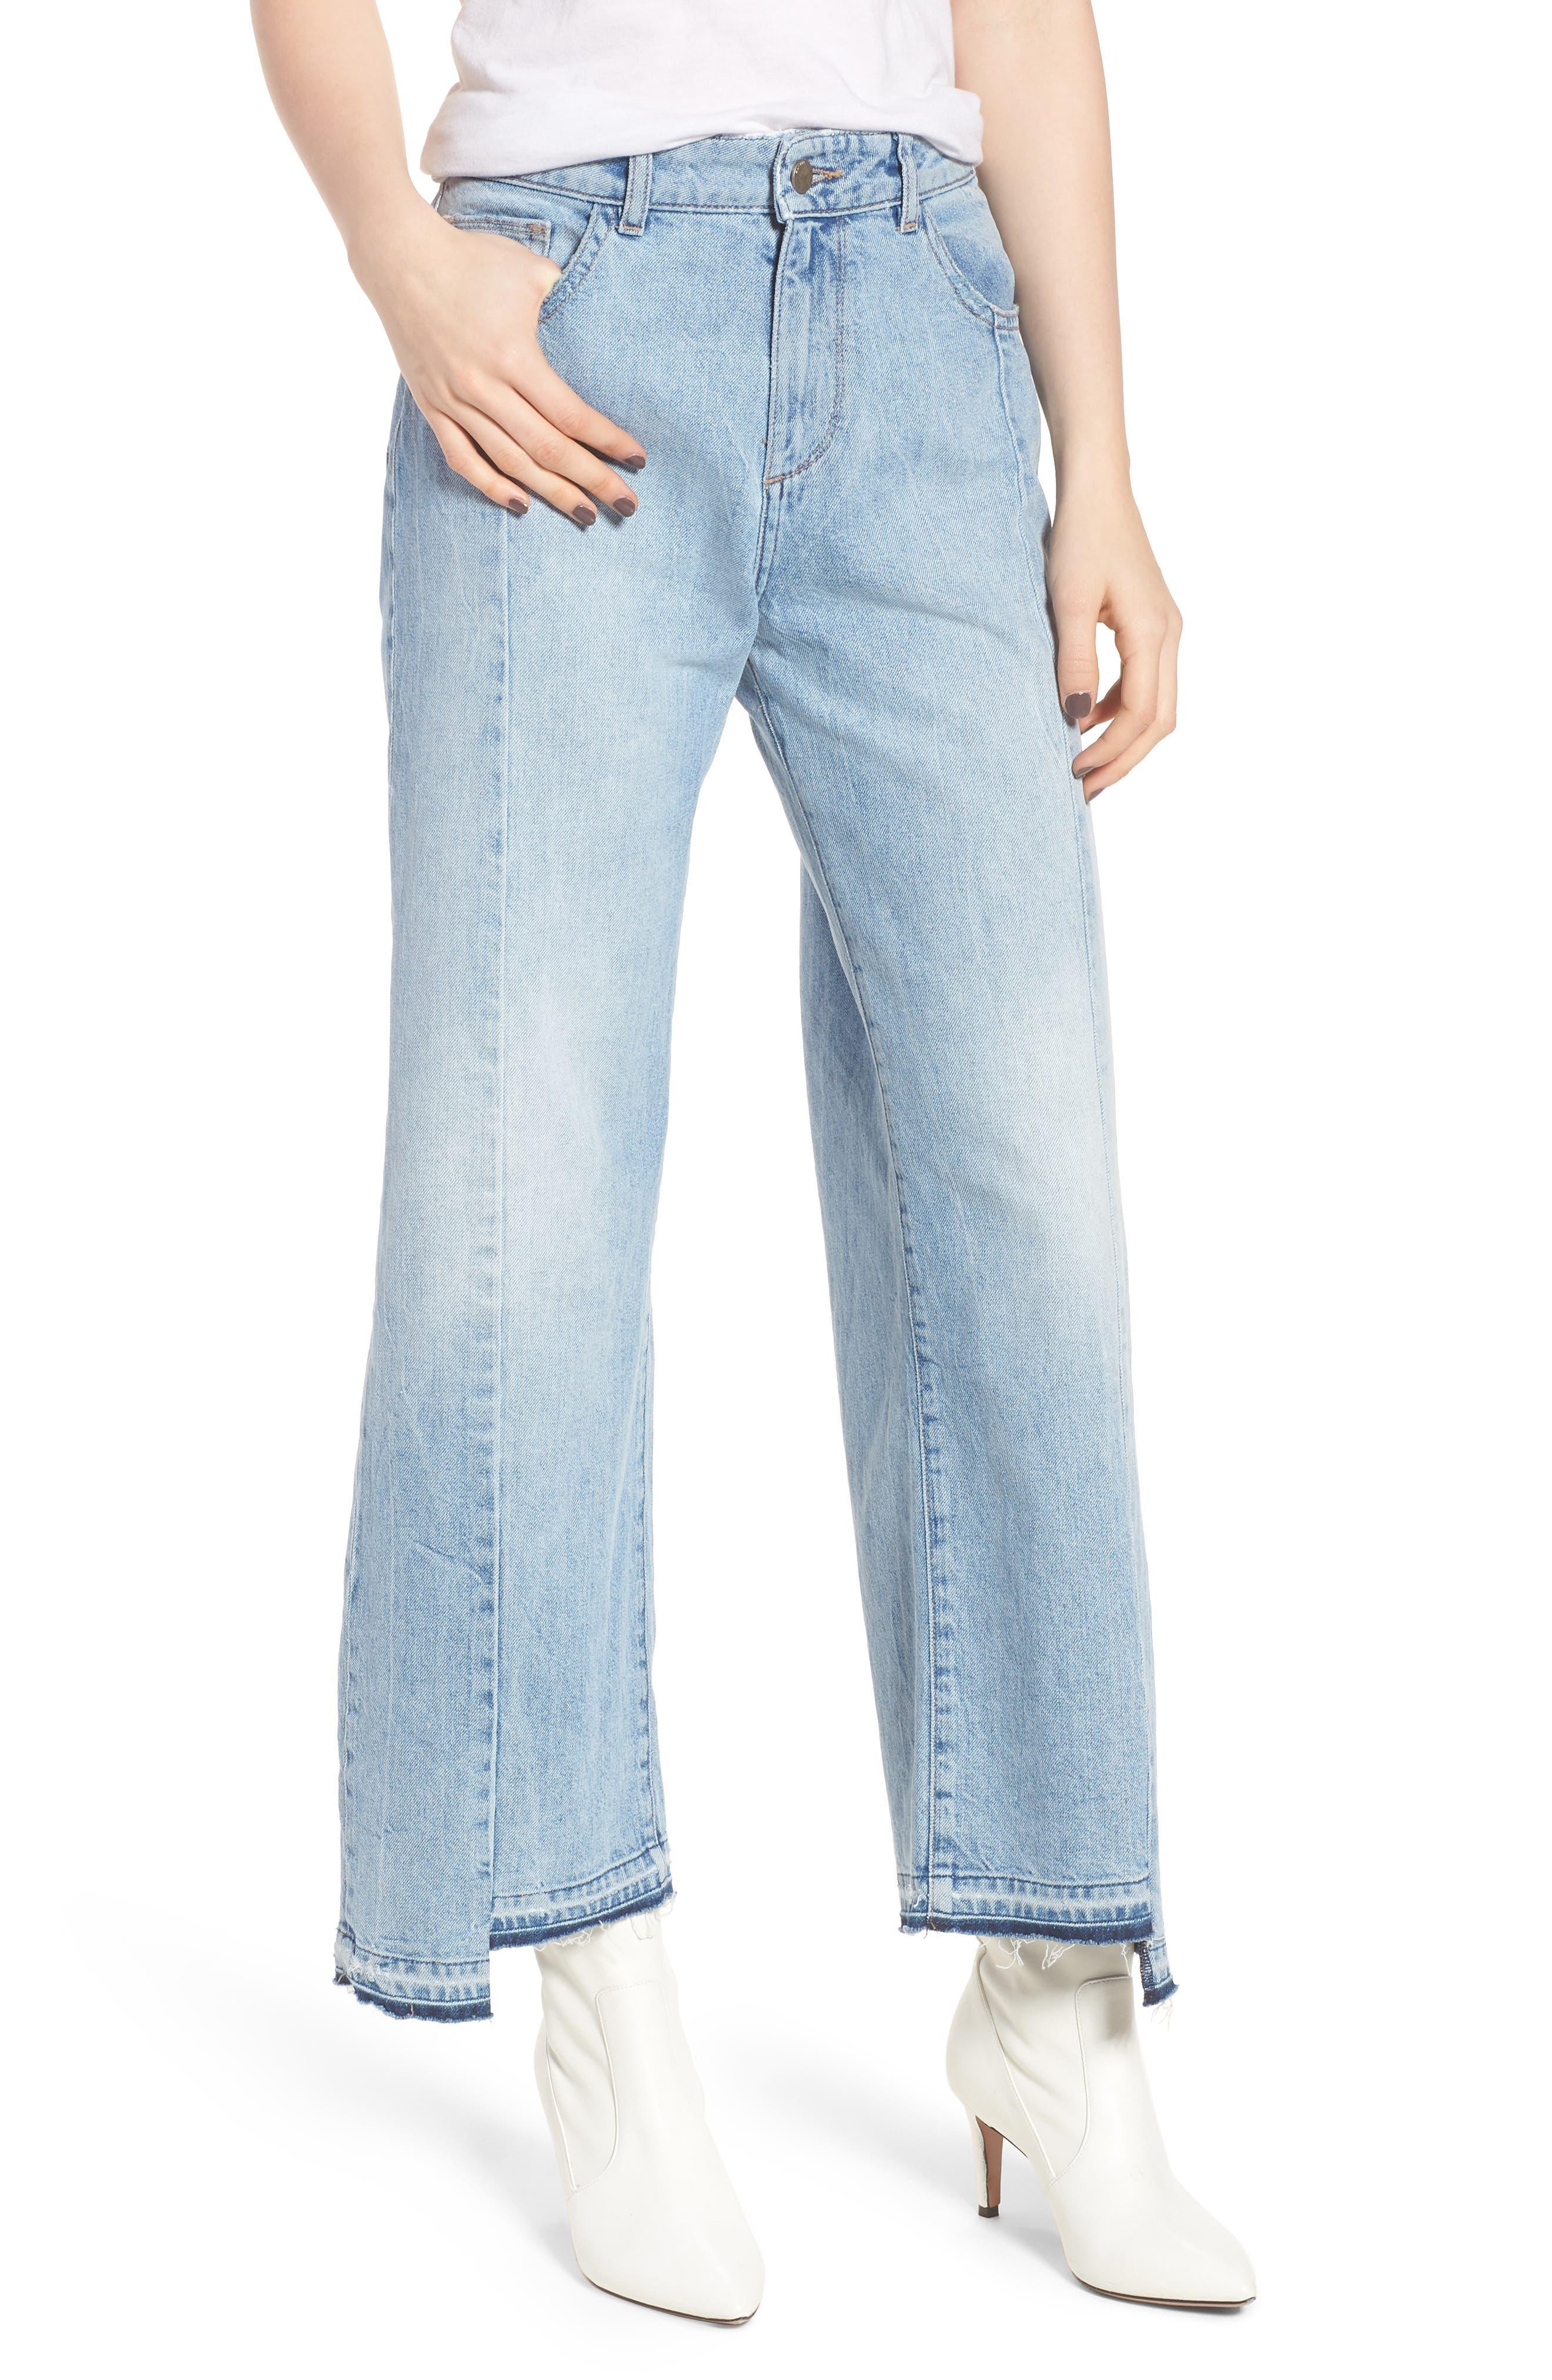 Hepburn High Waist Wide Leg Jeans,                             Main thumbnail 1, color,                             Oldtown